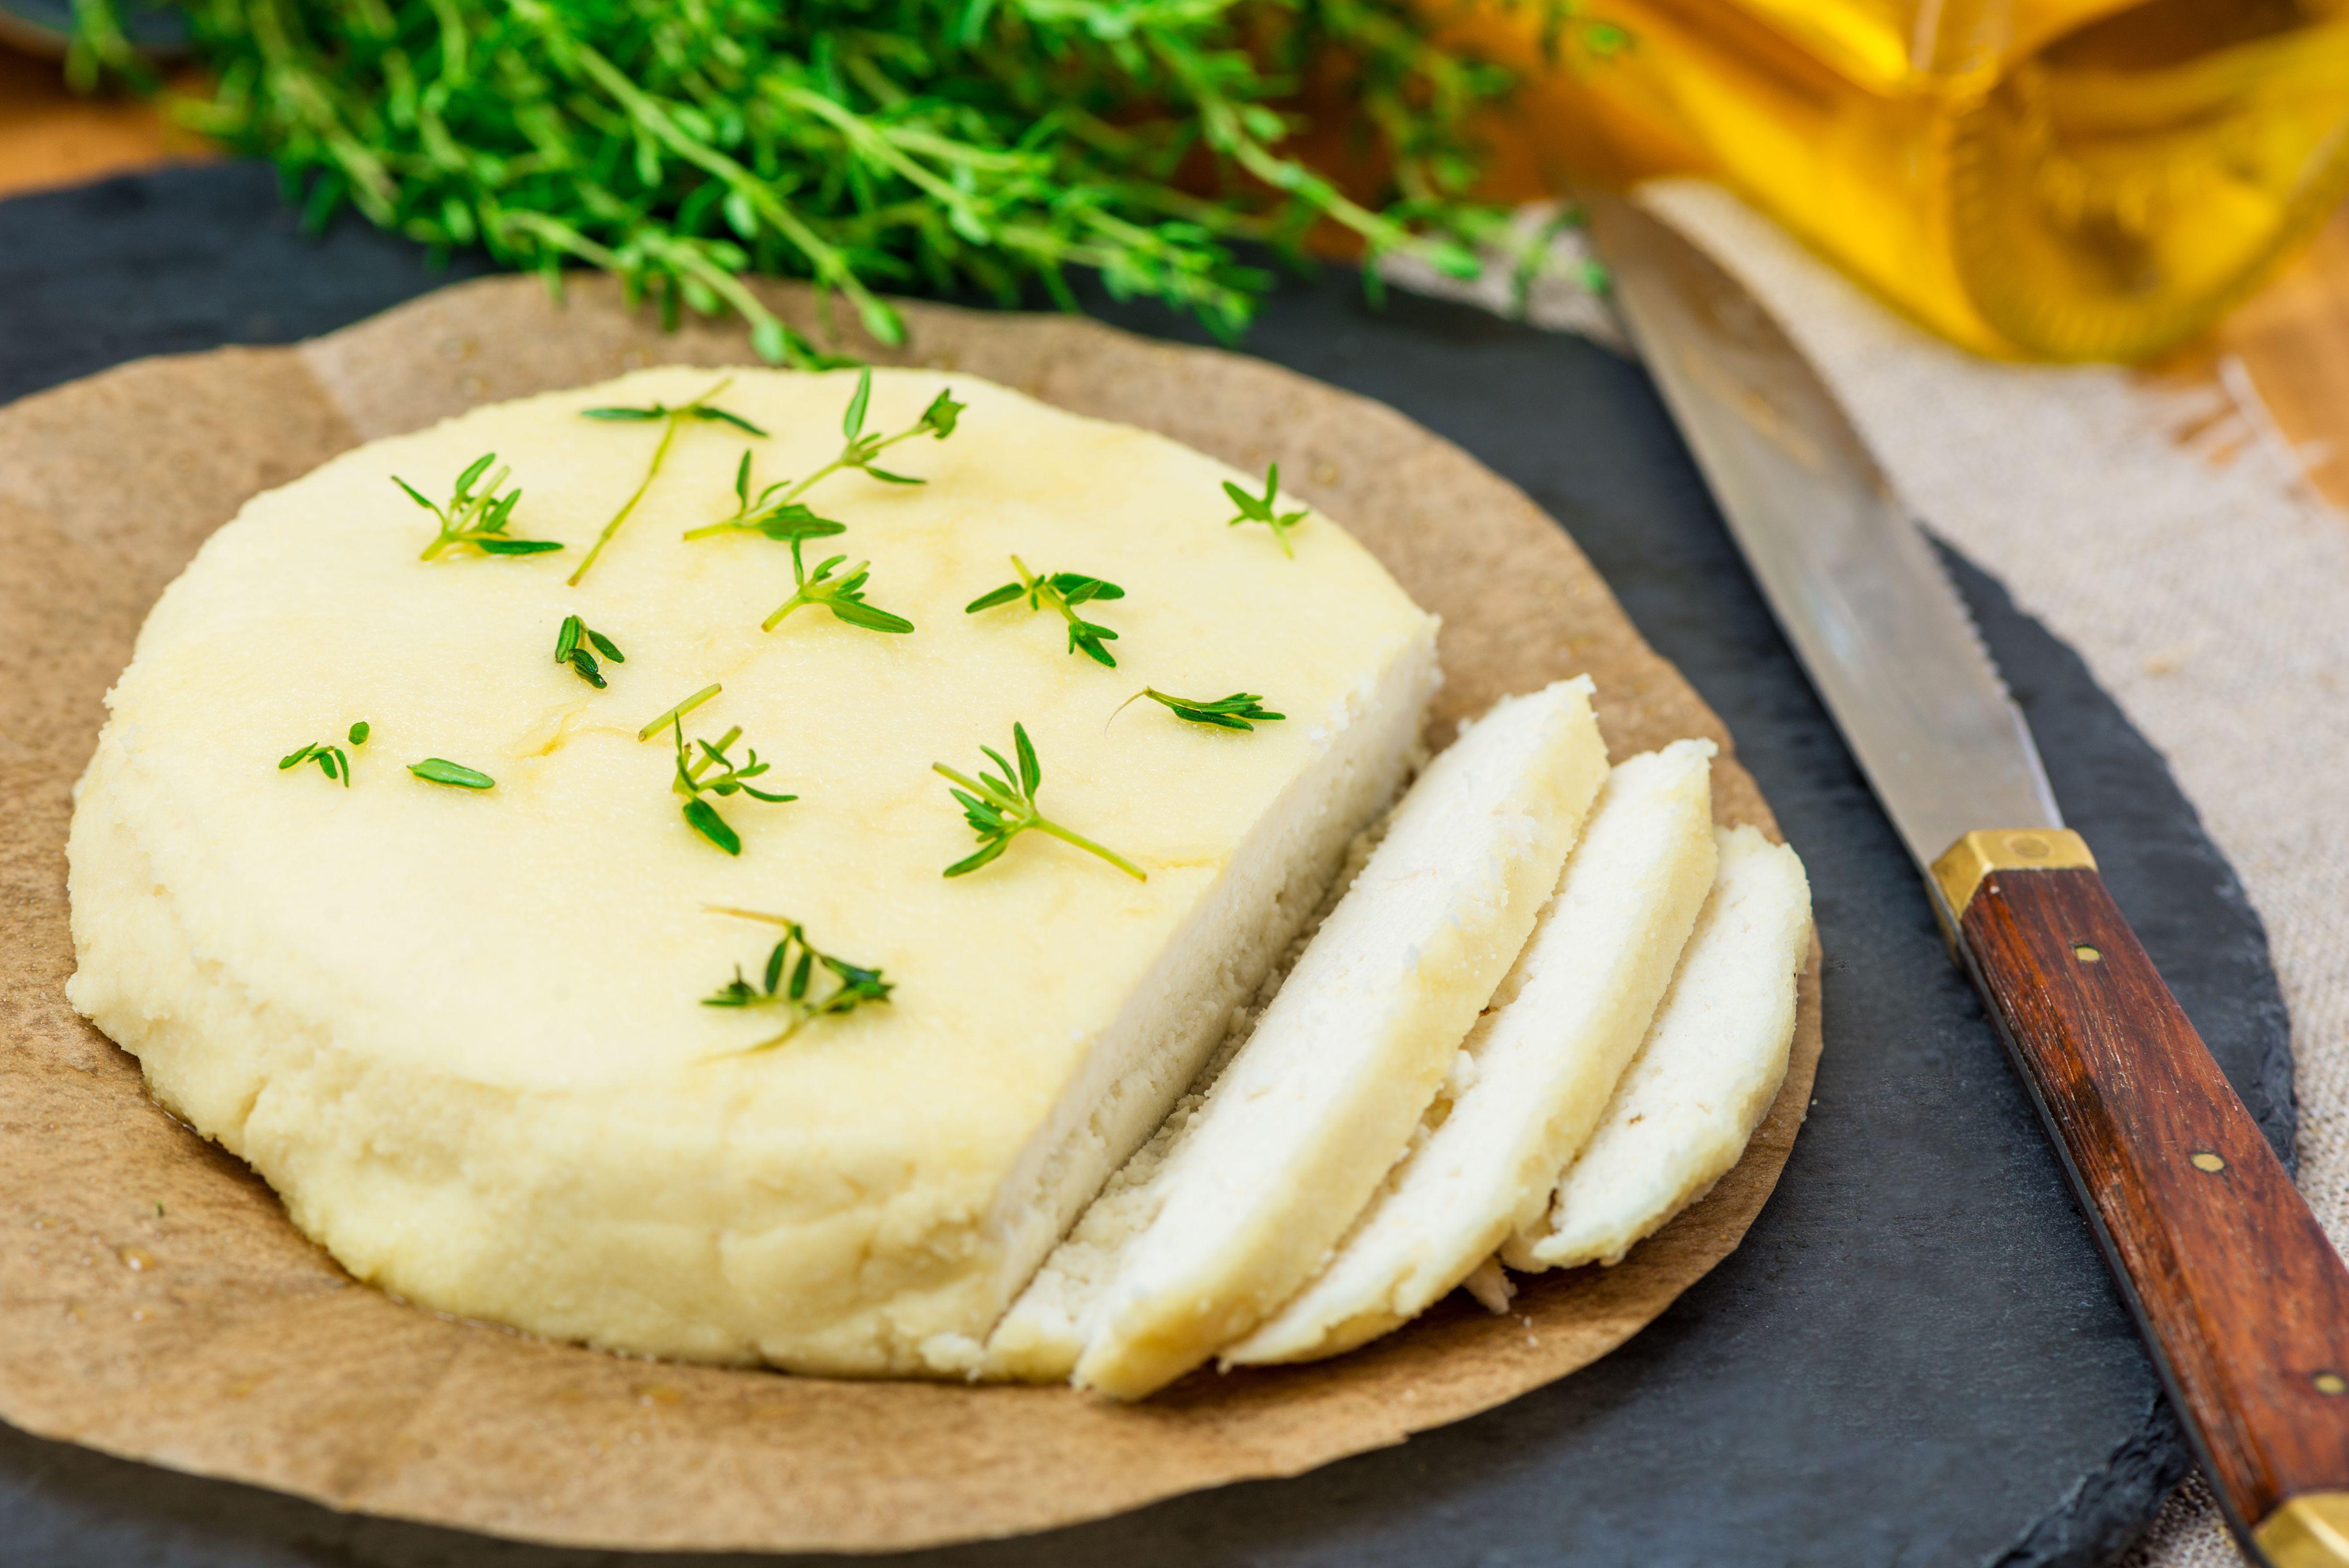 Homemade almond cheese